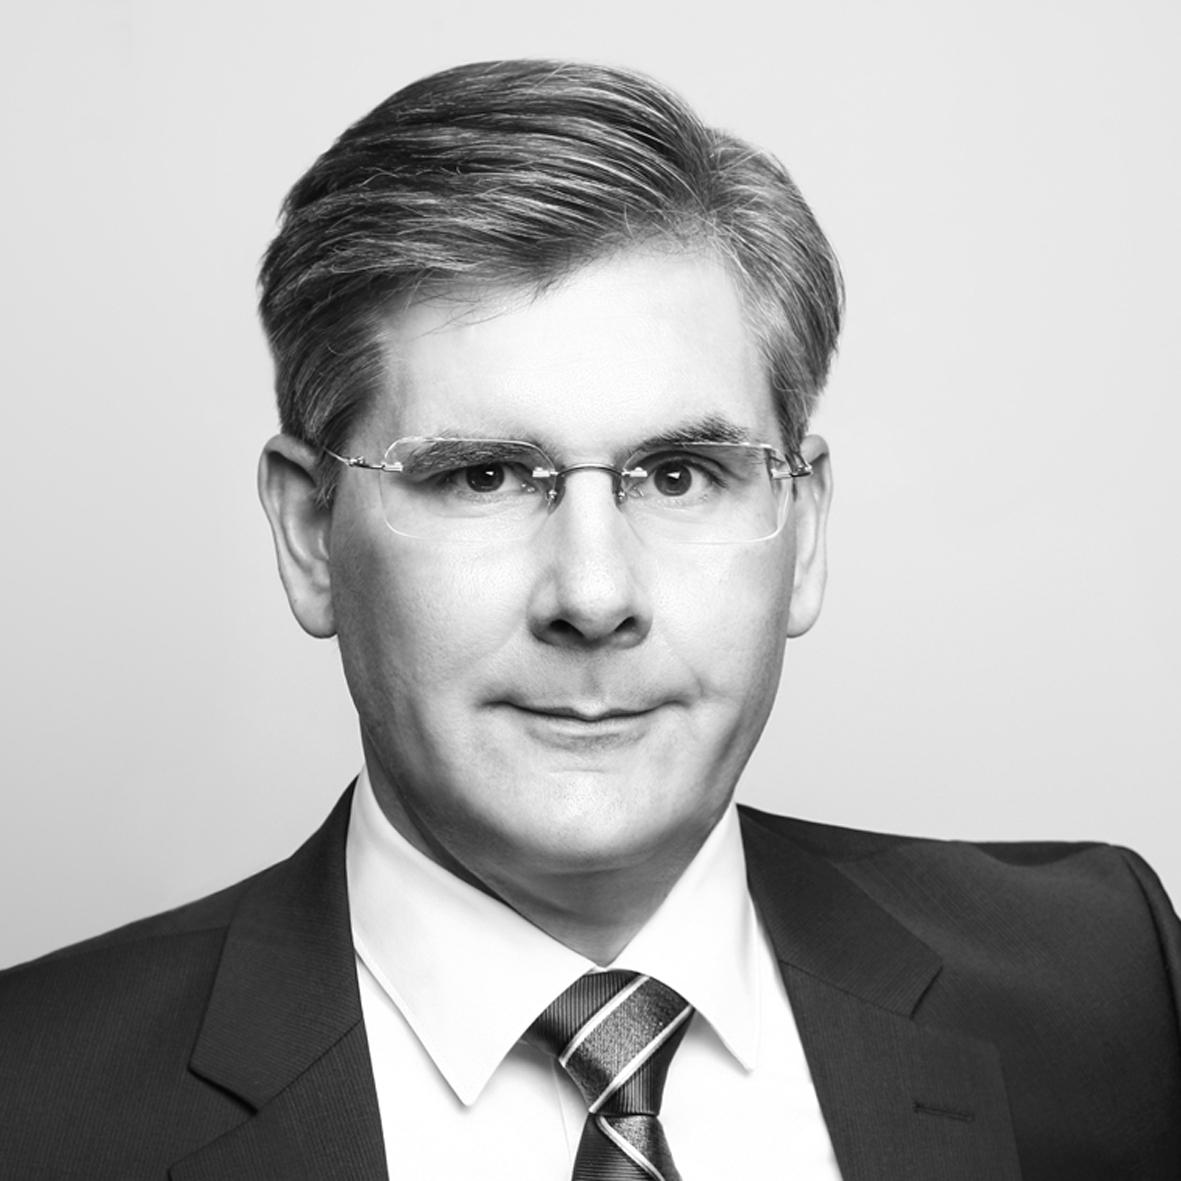 Karsten Harlandt